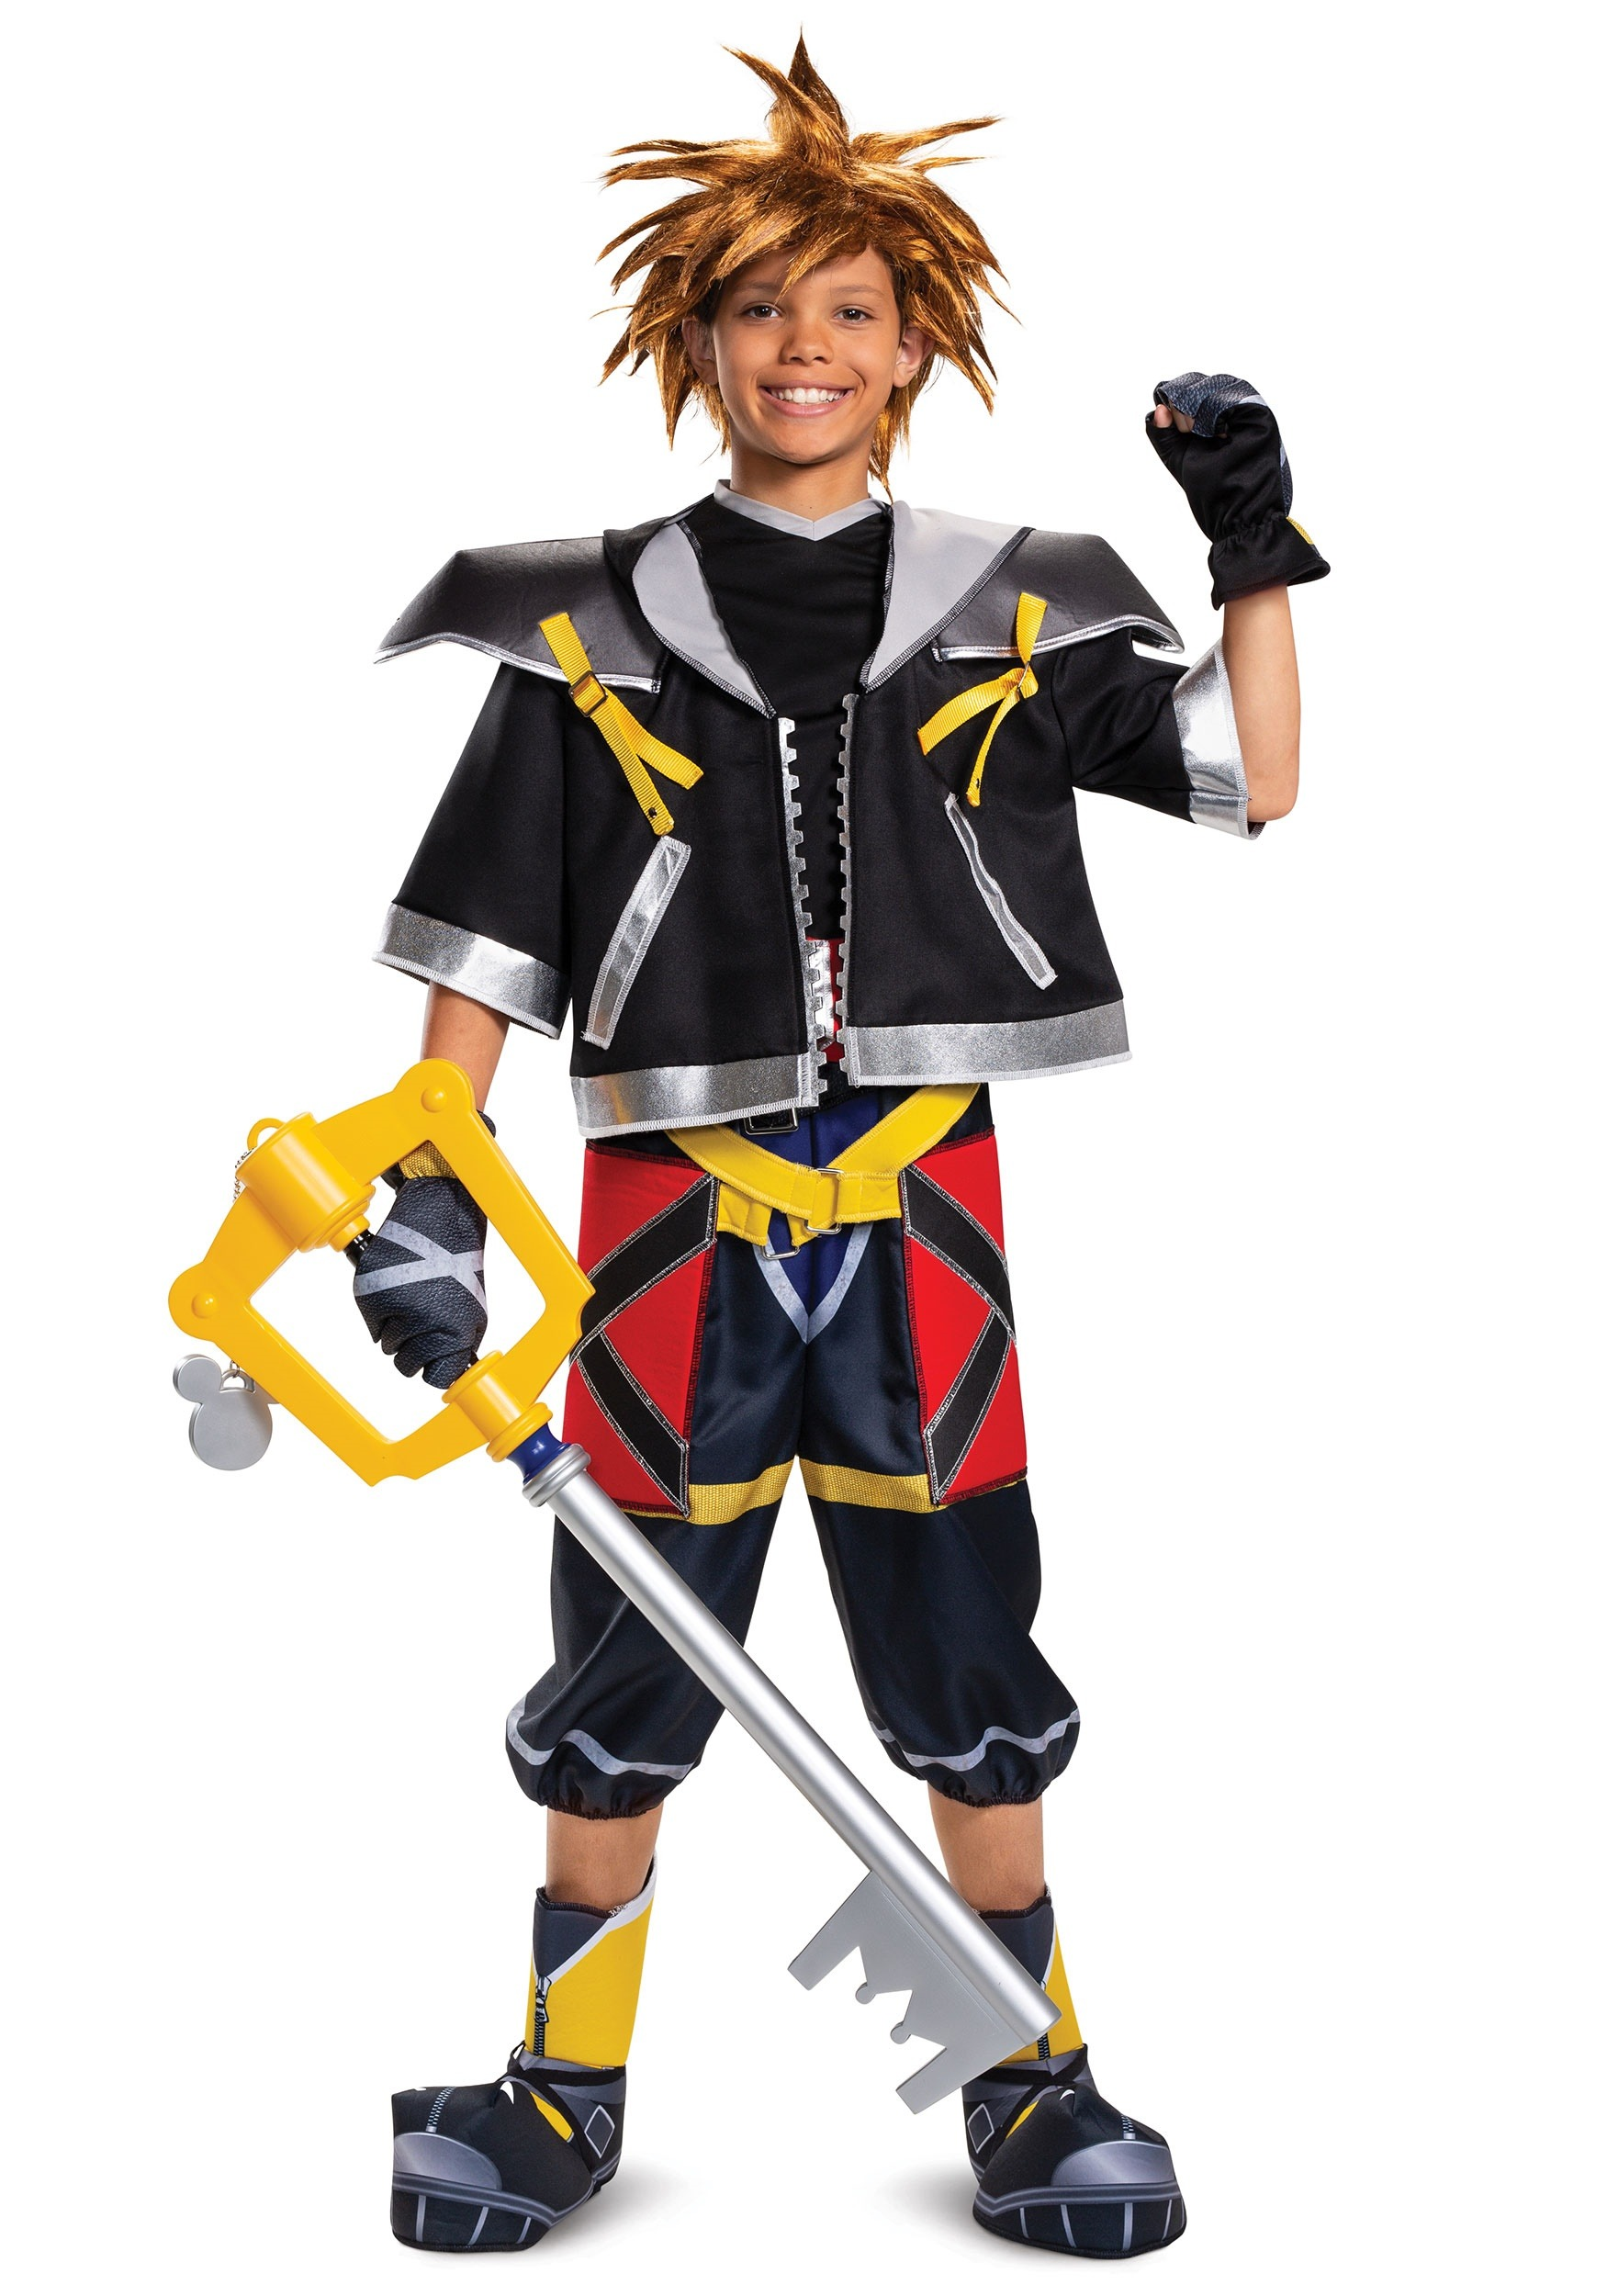 Deluxe Kingdom Hearts Teen Sora Costume Bott Funko Pop Riku